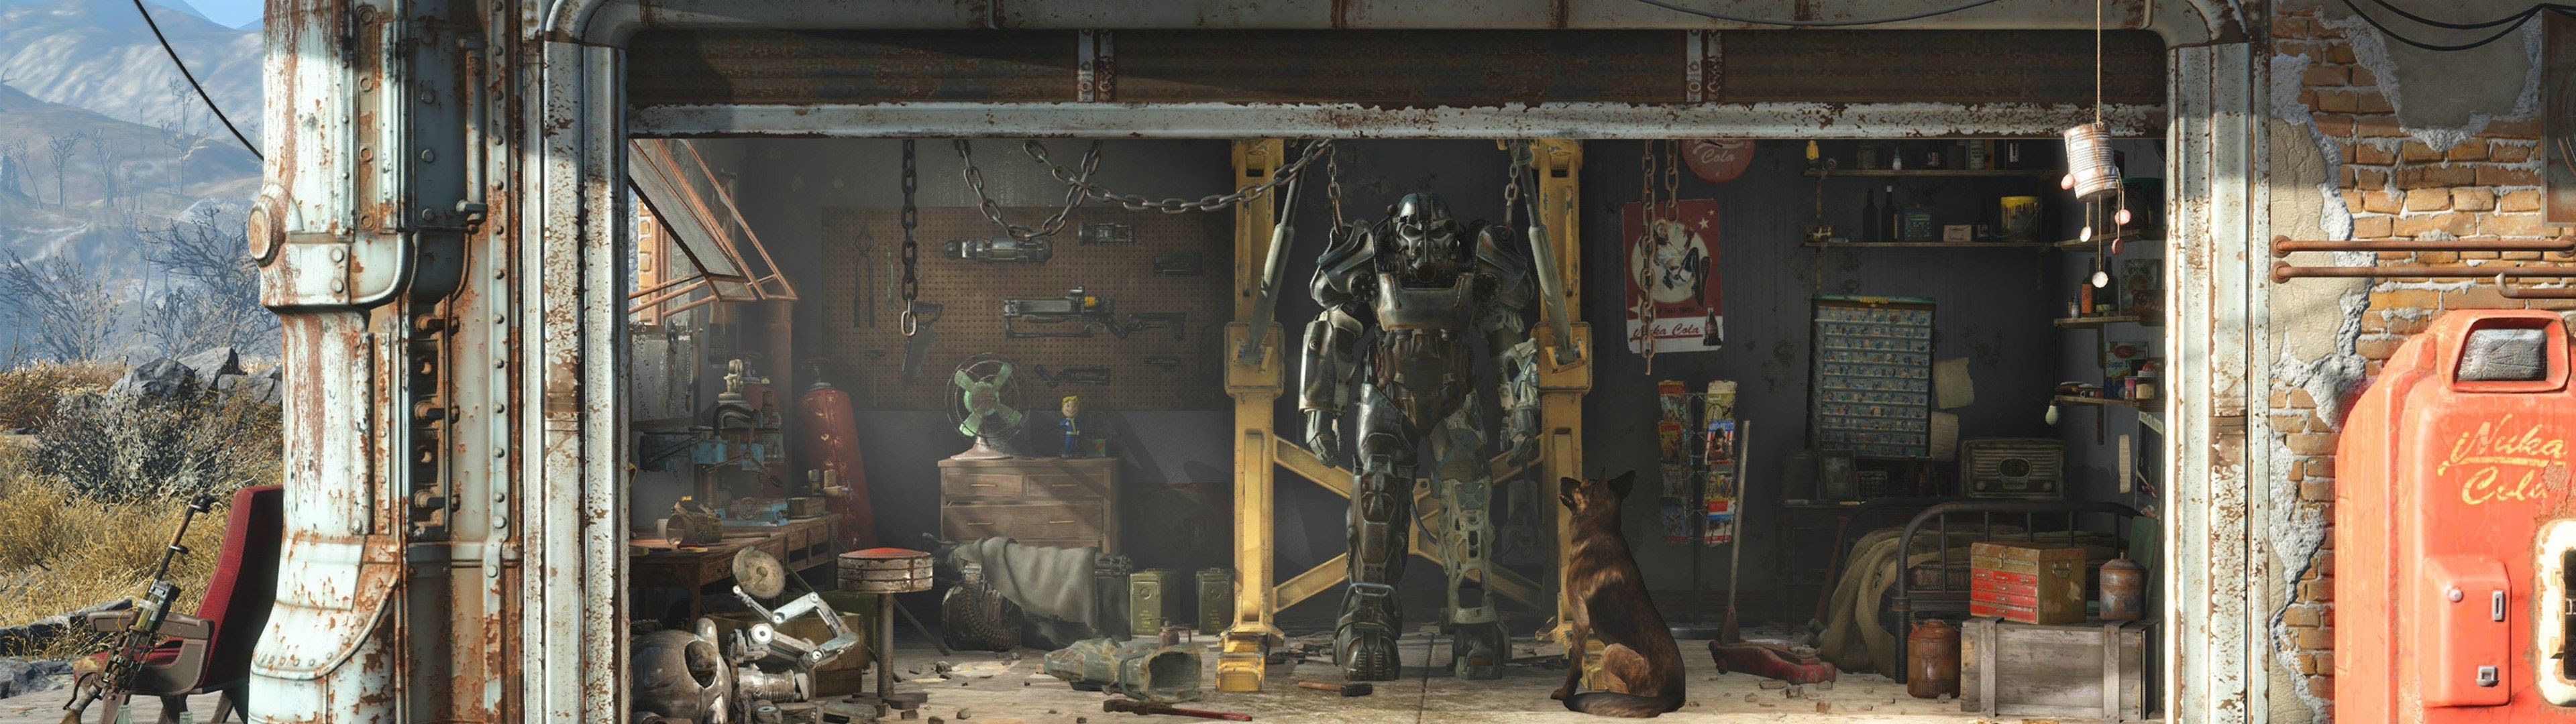 Fallout 4 Dual Screen Wallpaper 56 Images